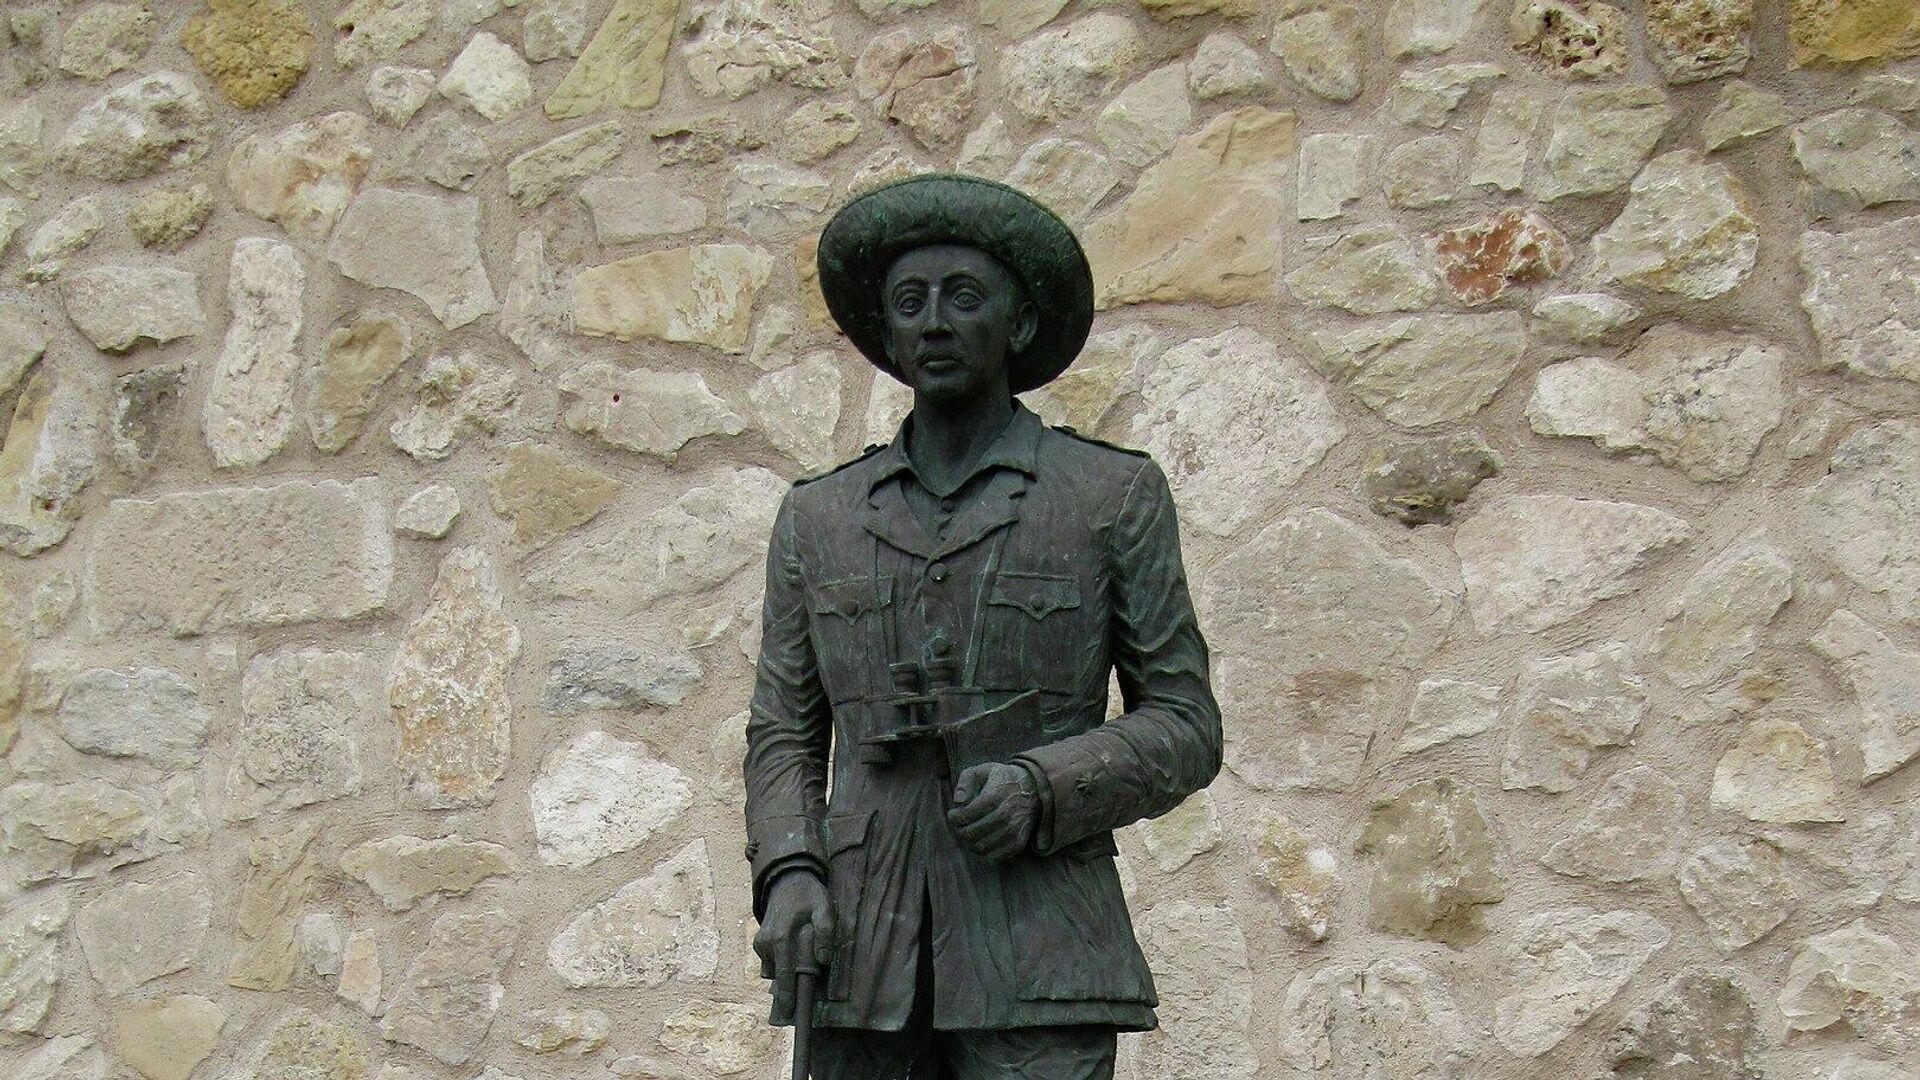 Estatua del comandante de la Legión Francisco Franco Bahamonde en Melilla, España - Sputnik Mundo, 1920, 22.02.2021